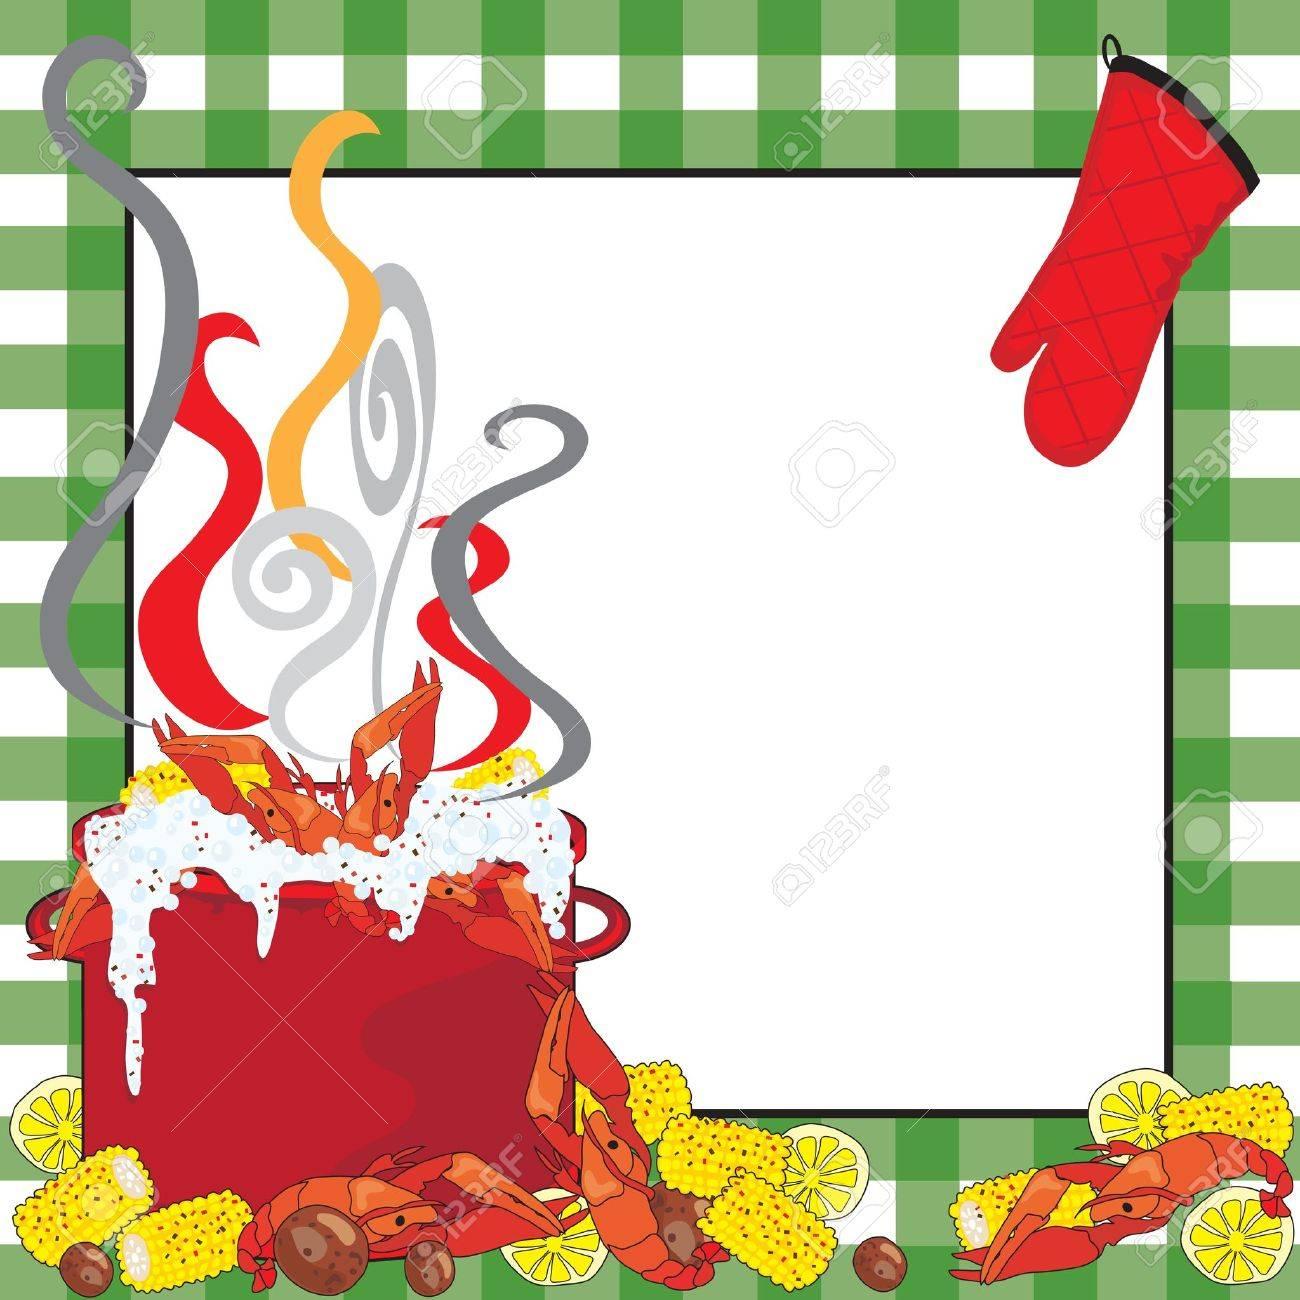 Crawfish Boil Invitation Royalty Free Cliparts Vectors And Stock